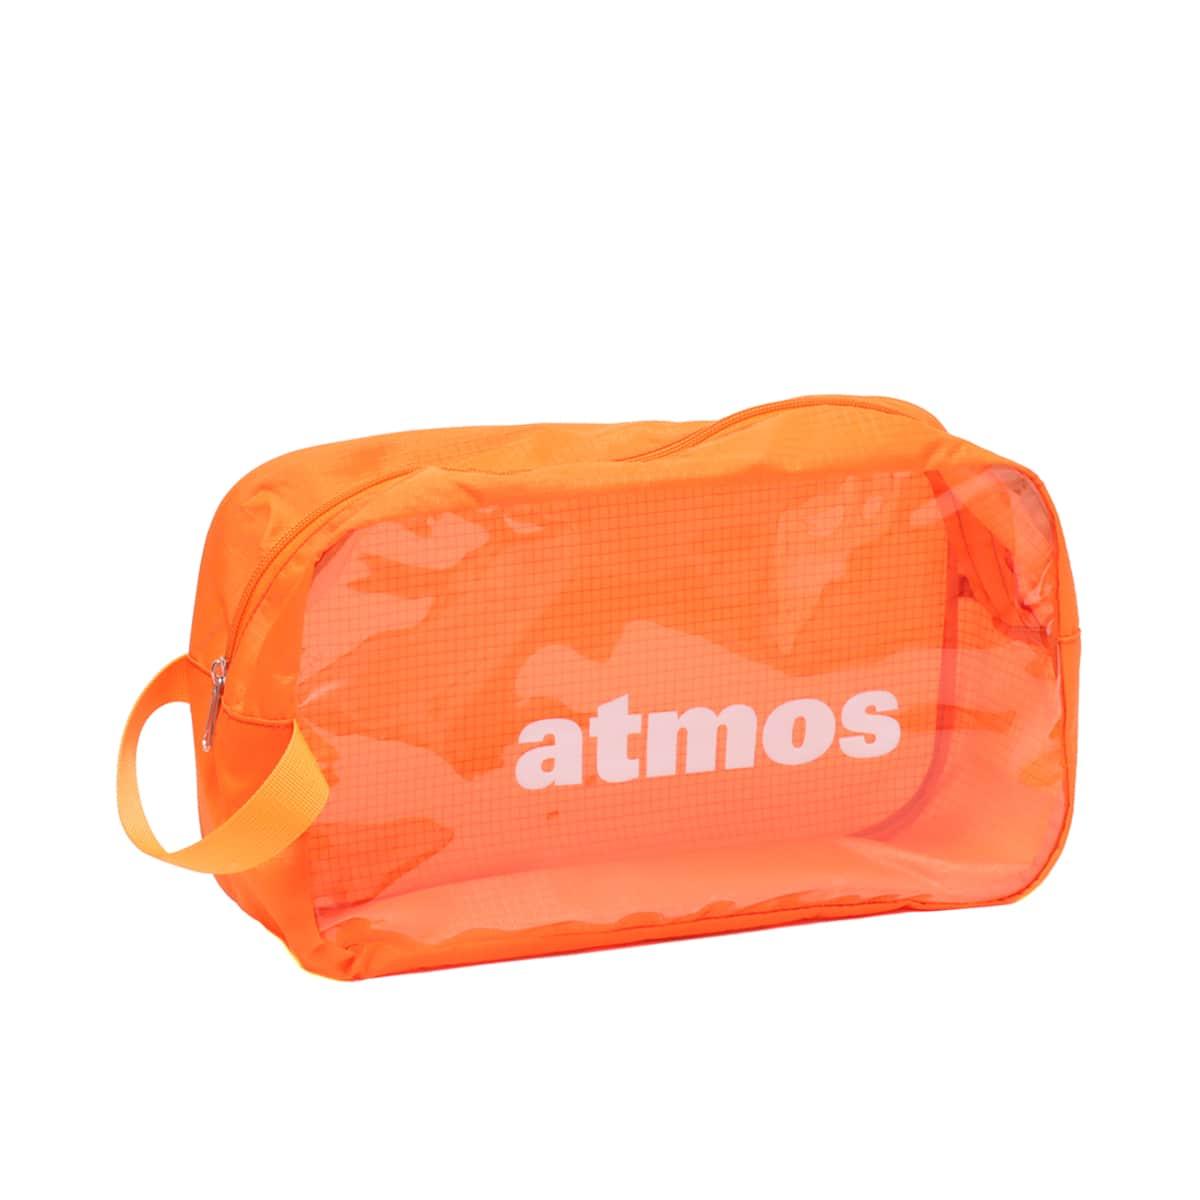 atmos CLEAR SHOES CASE ORANGE 21SP-I_photo_large